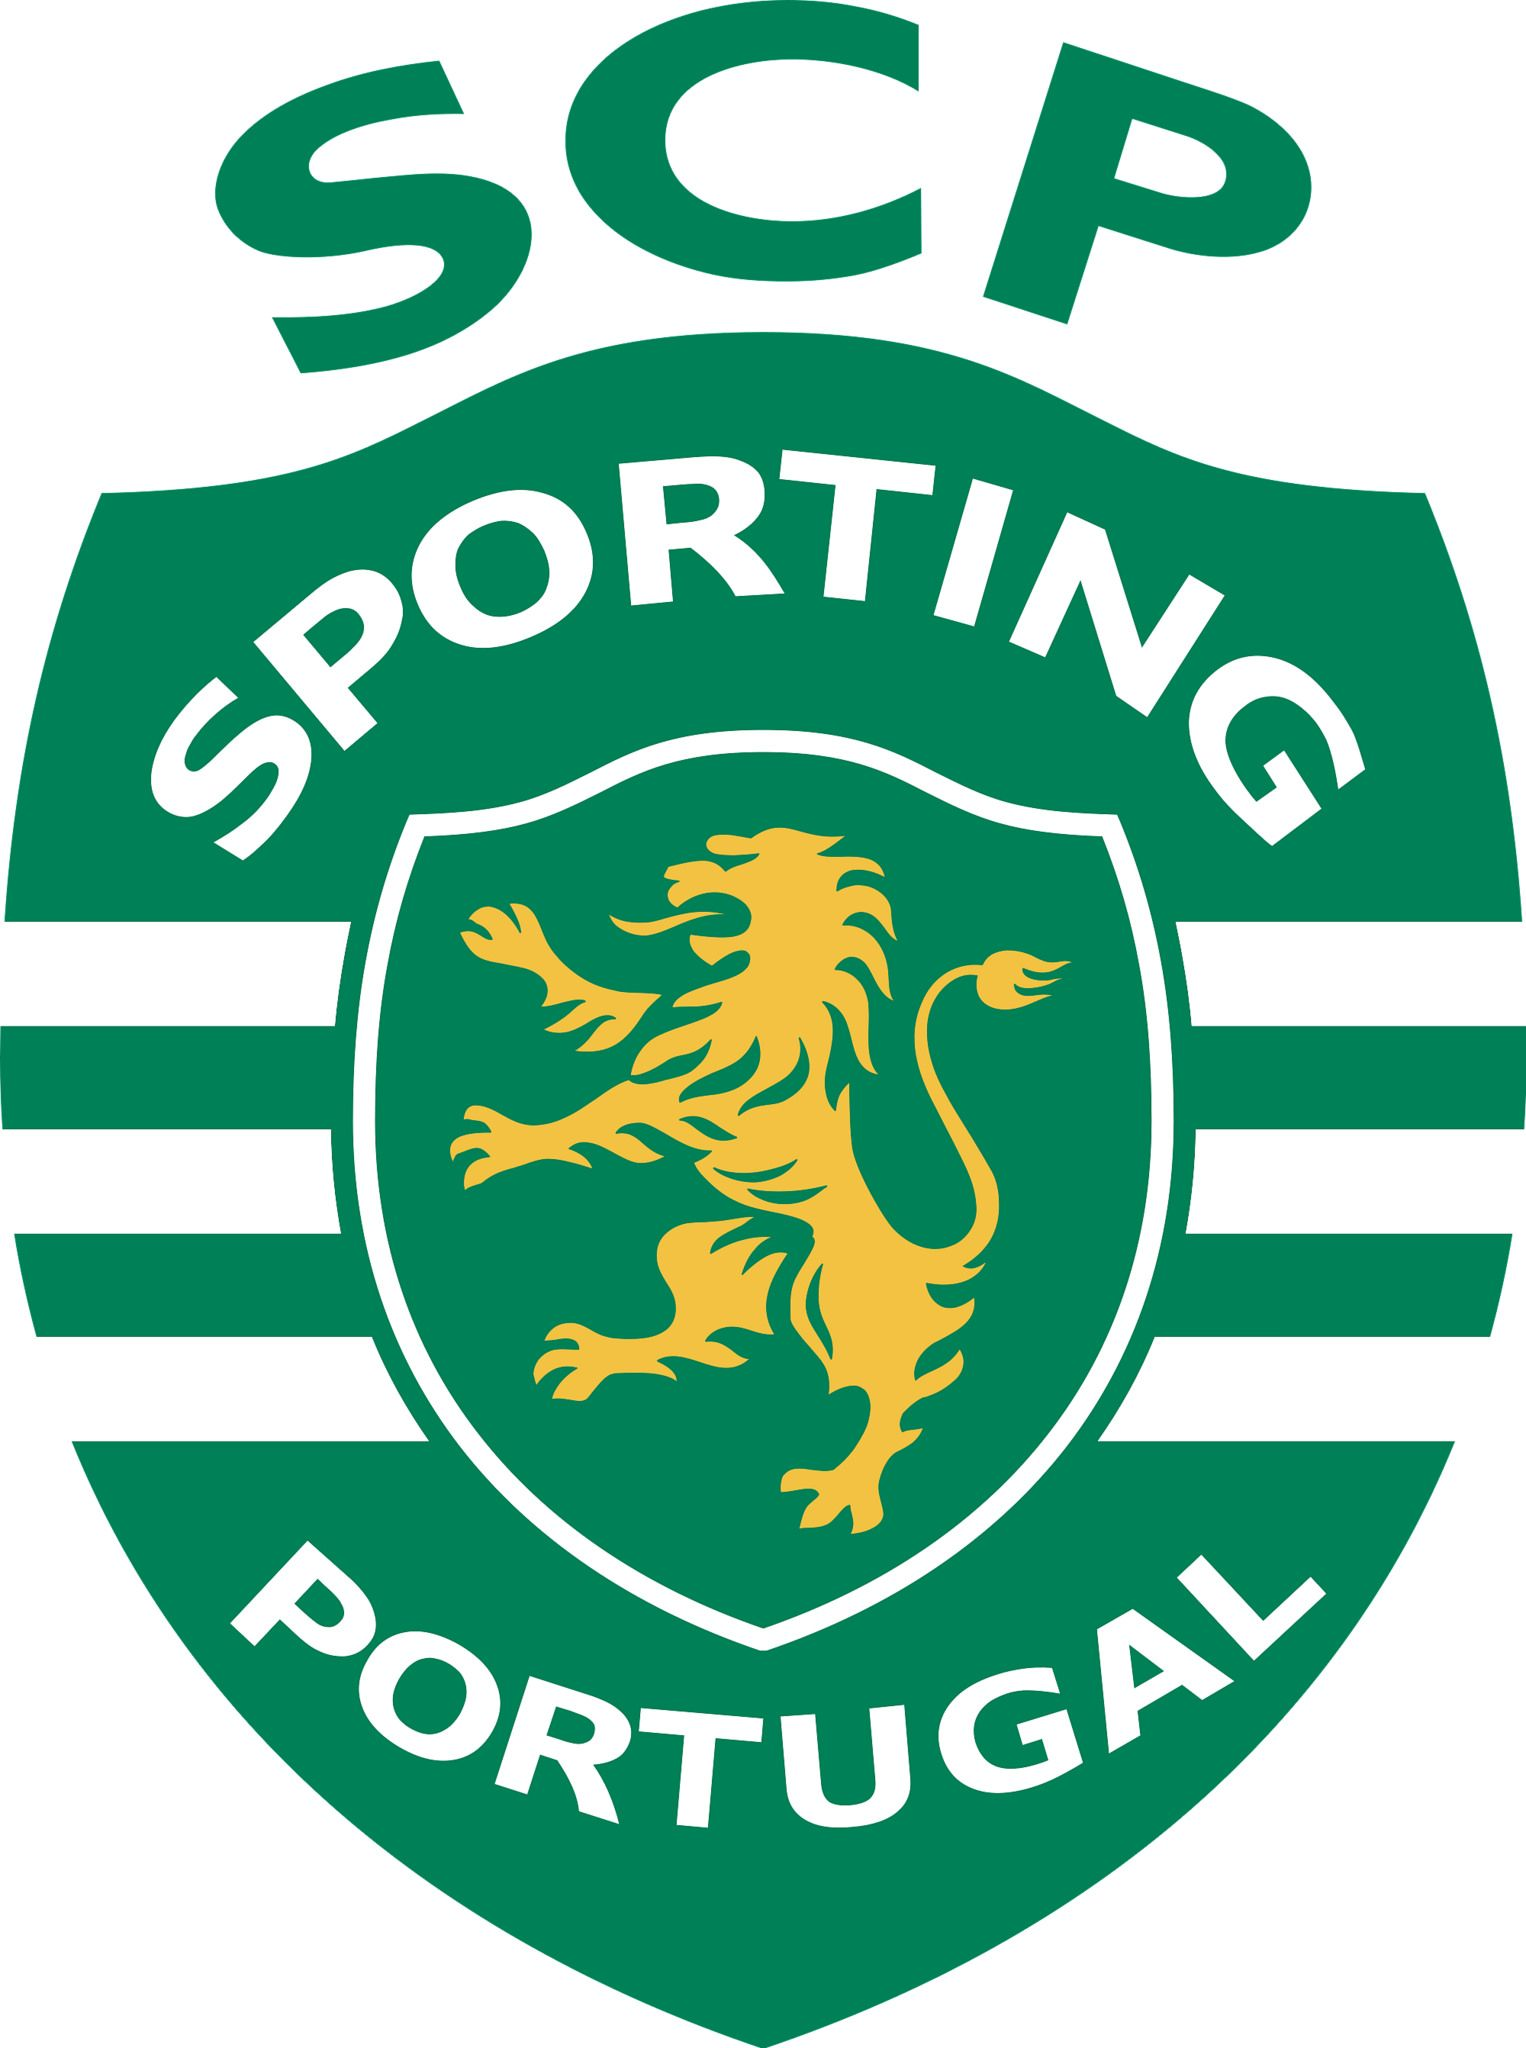 SC Braga Portugal Soccer Football Car Bumper Sticker Decal 4 x 5